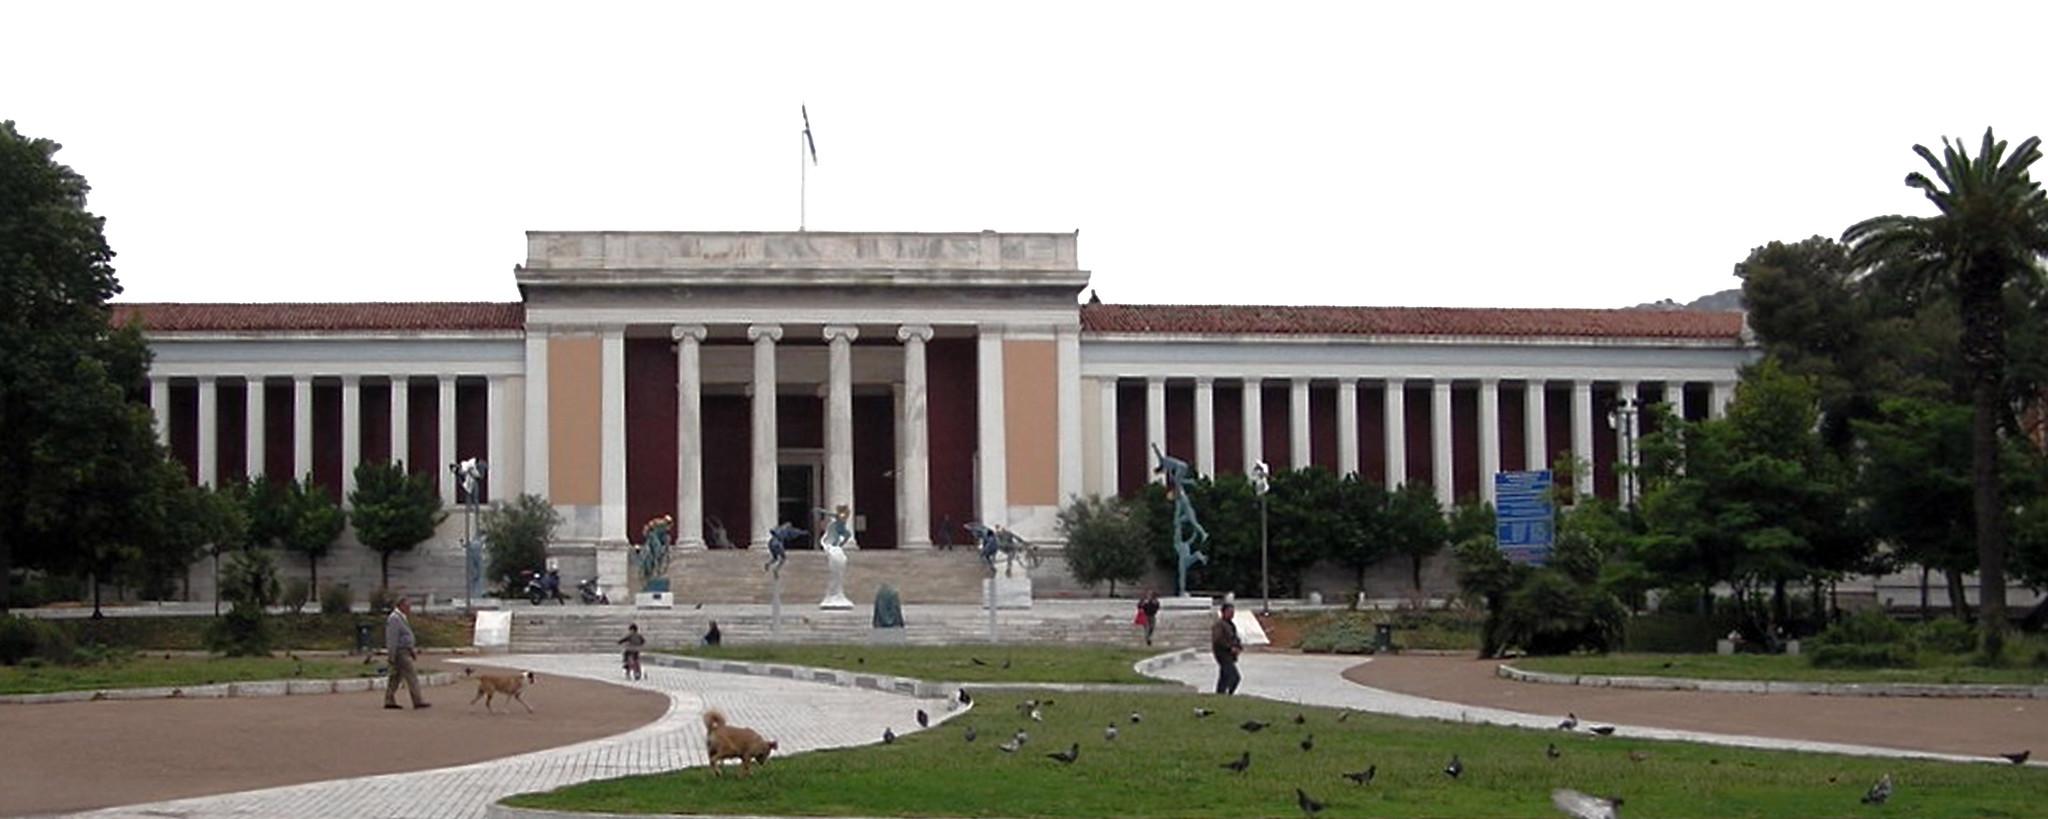 Grecia exterior edificio Museo Arqueologico Nacional de Atenas